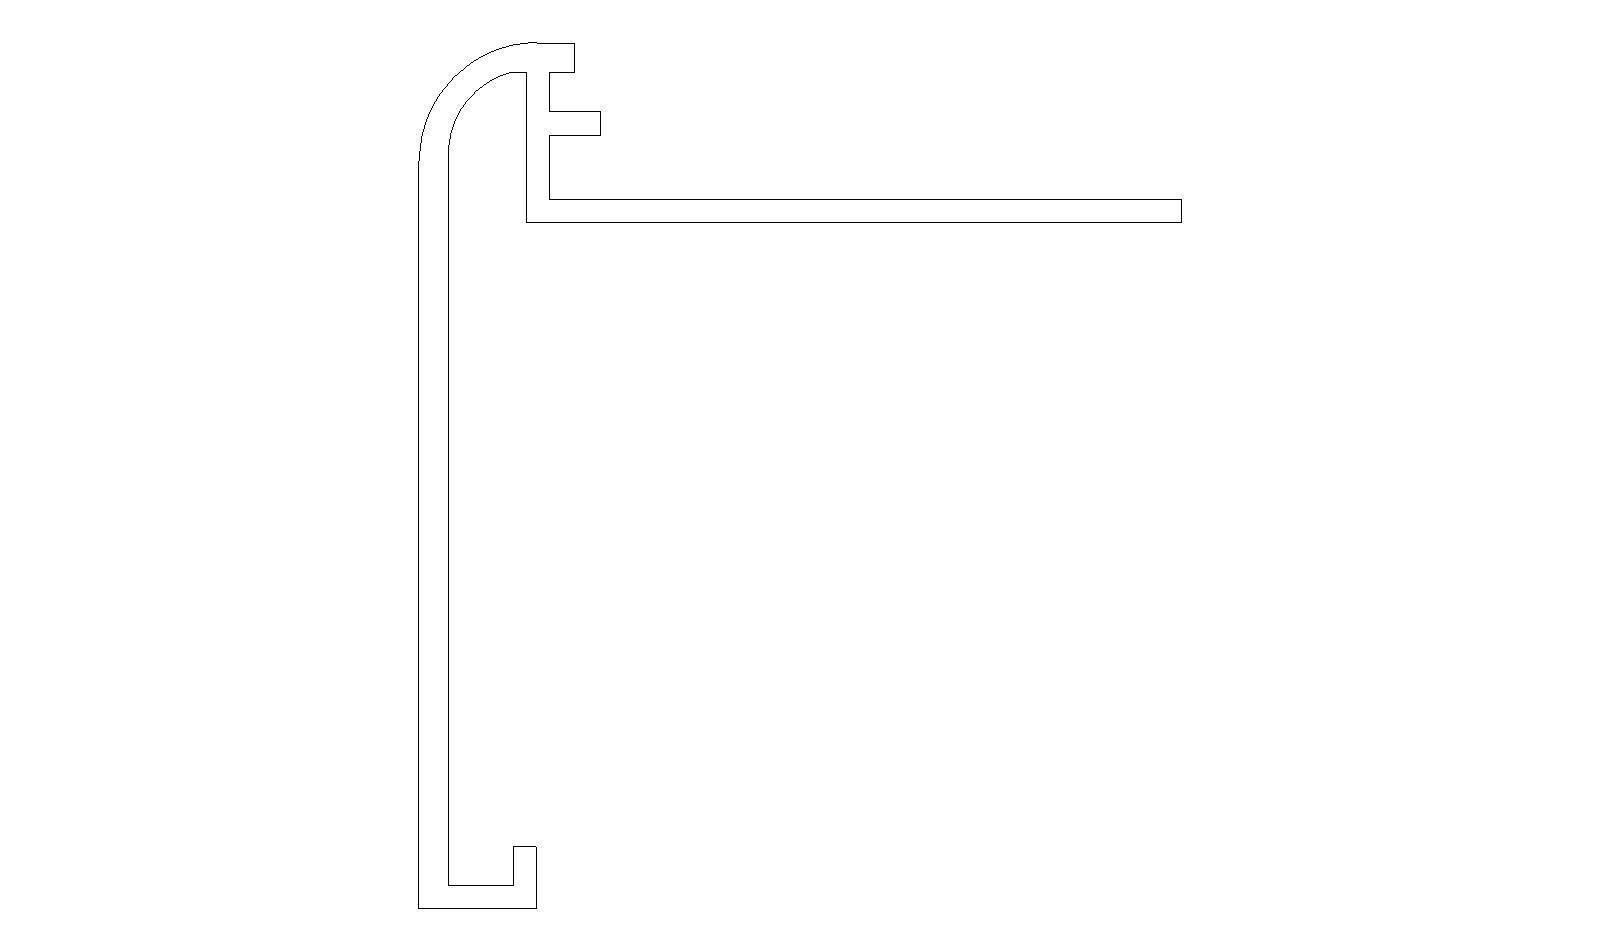 Countertop Material Revit : BIM Objects / Families